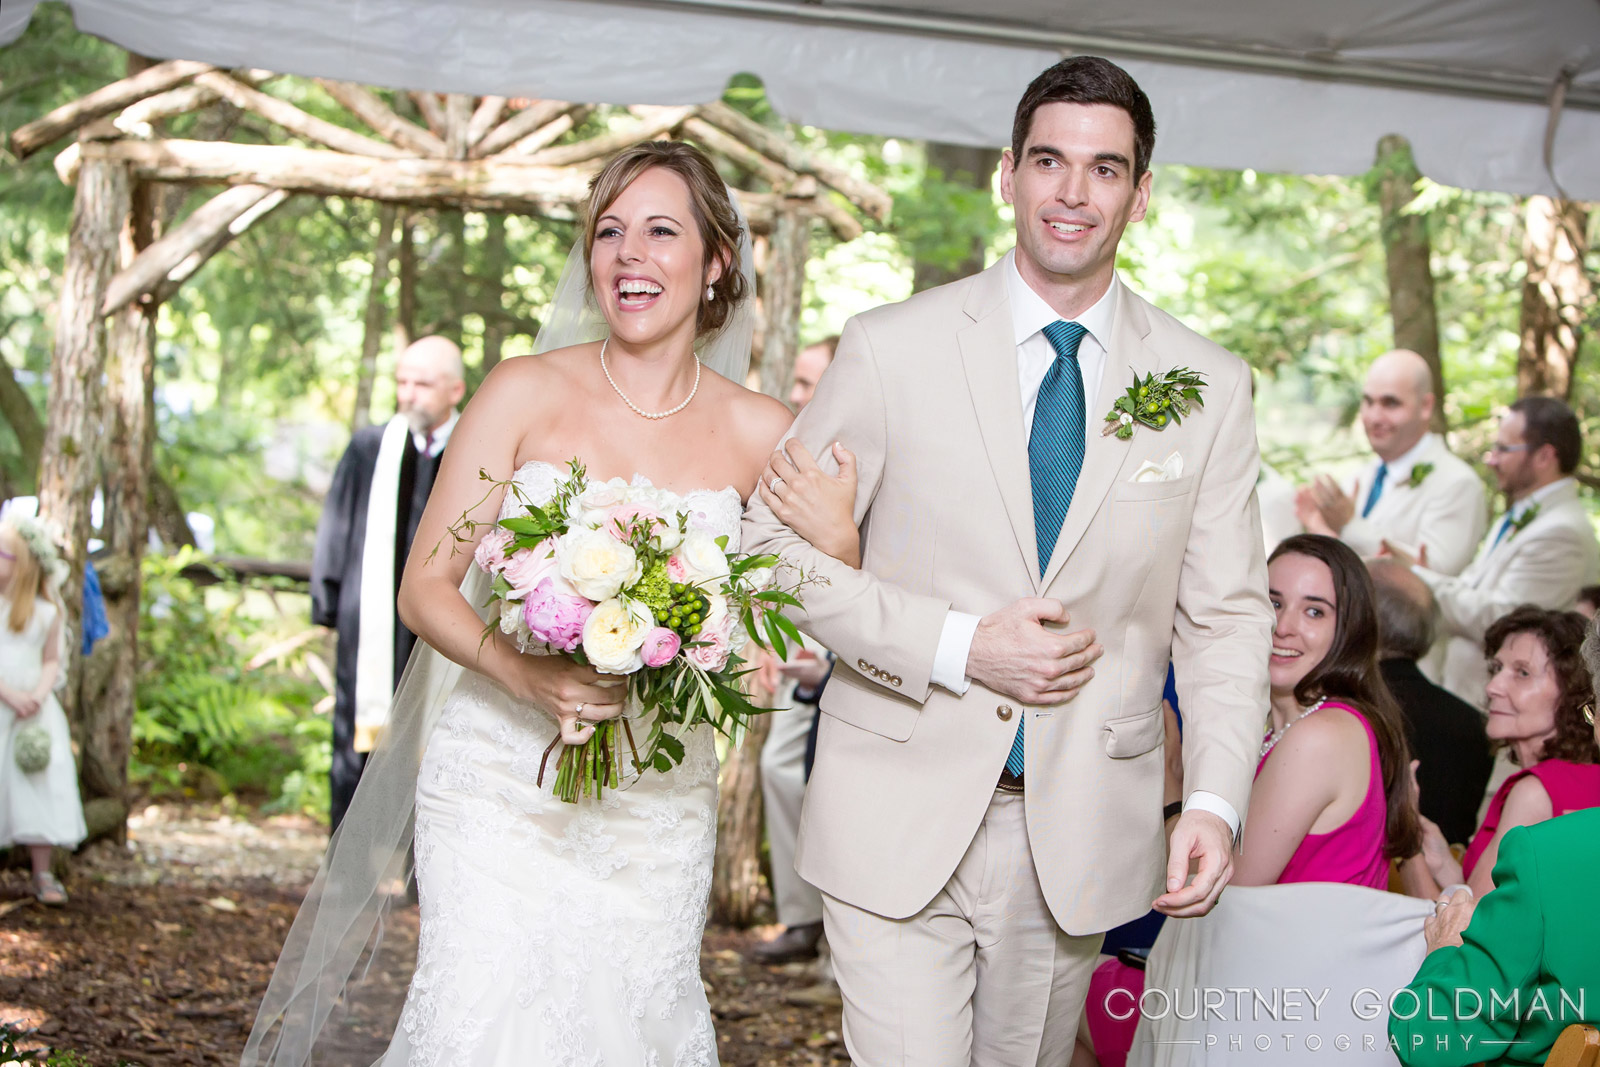 Atlanta-Wedding-Photography-by-Courtney-Goldman-25.jpg